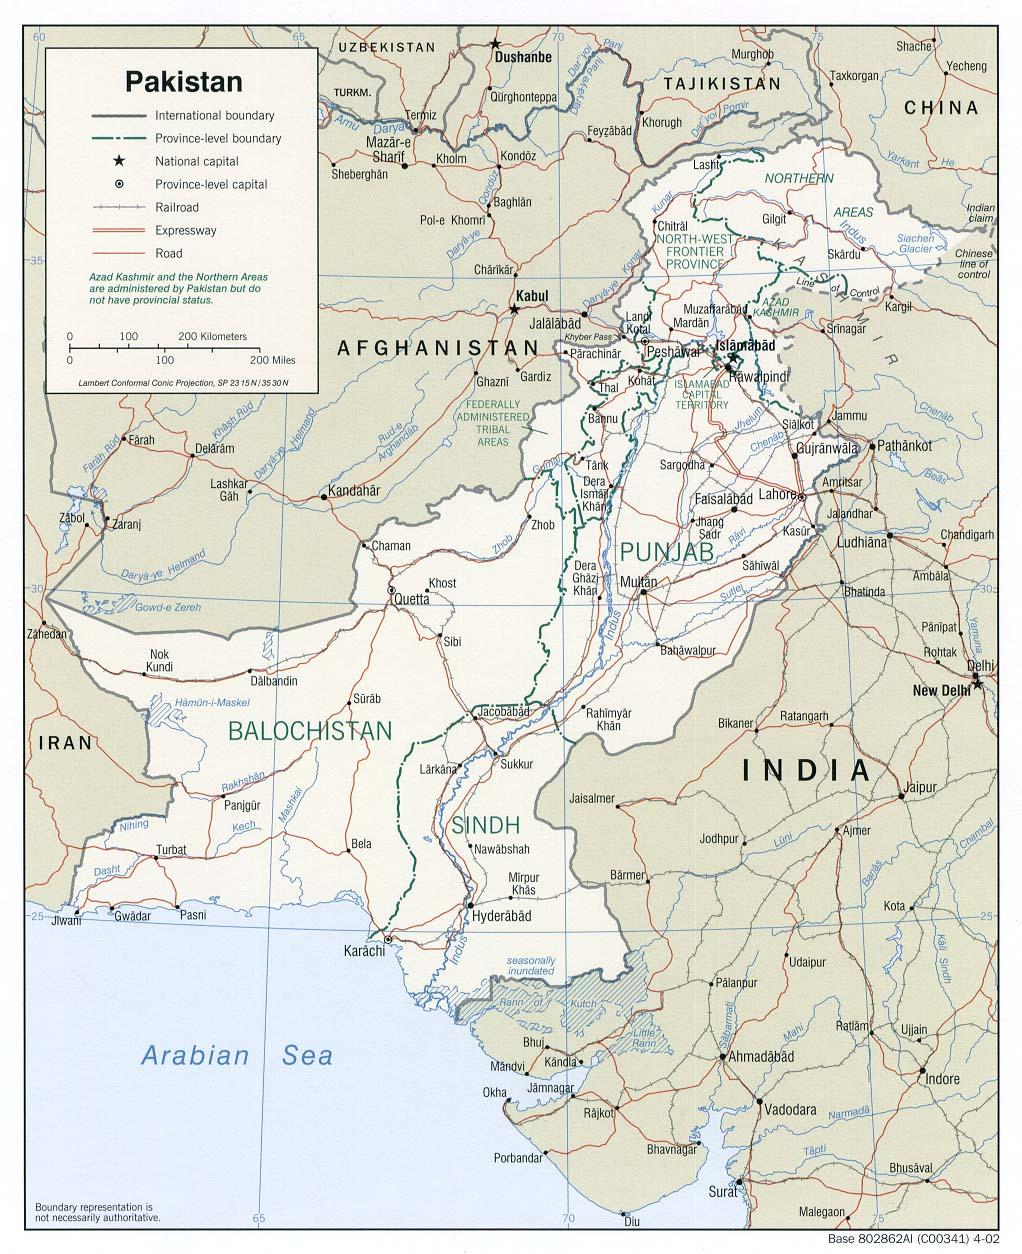 Download Free stan Maps on islamabad map, courtallam map, chhatrapati shivaji international airport map, lahore map, saddar map, south asia map, peshawar map, india map, trivandrum map, duqm map, karachi map, chennai map, assam map, colombo map, anantapur district map, ahmedabad gujarat map, myanmar map, dhaka map, magarpatta map, andhra pradesh map,